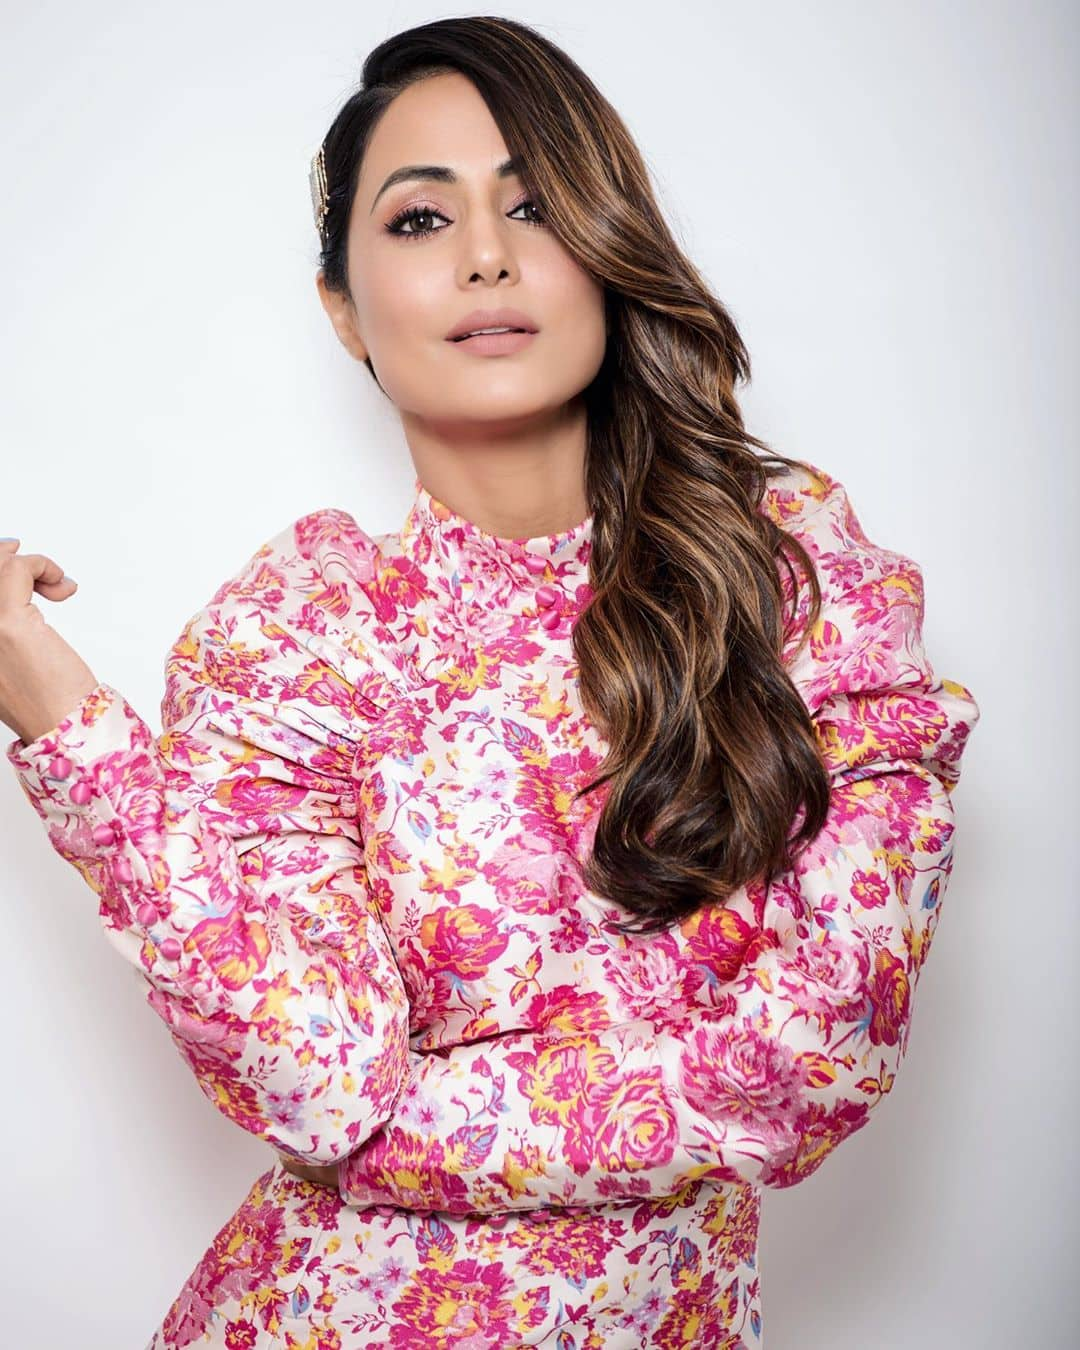 Hina Khan Looks Fresh as Roses